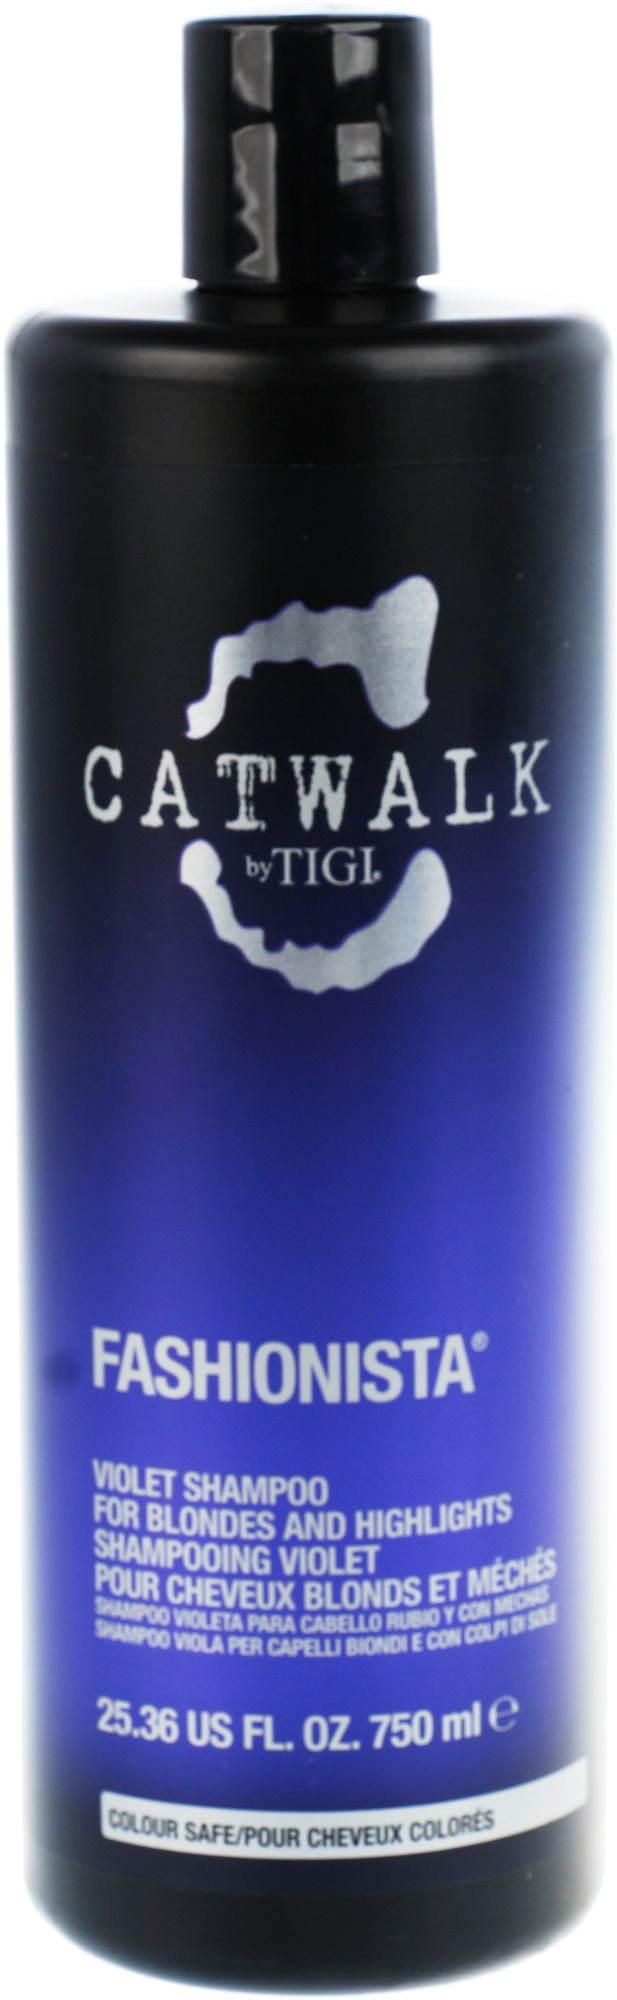 Tigi Catwalk Fashionista Violet sampon szőke hajra - 750 ml